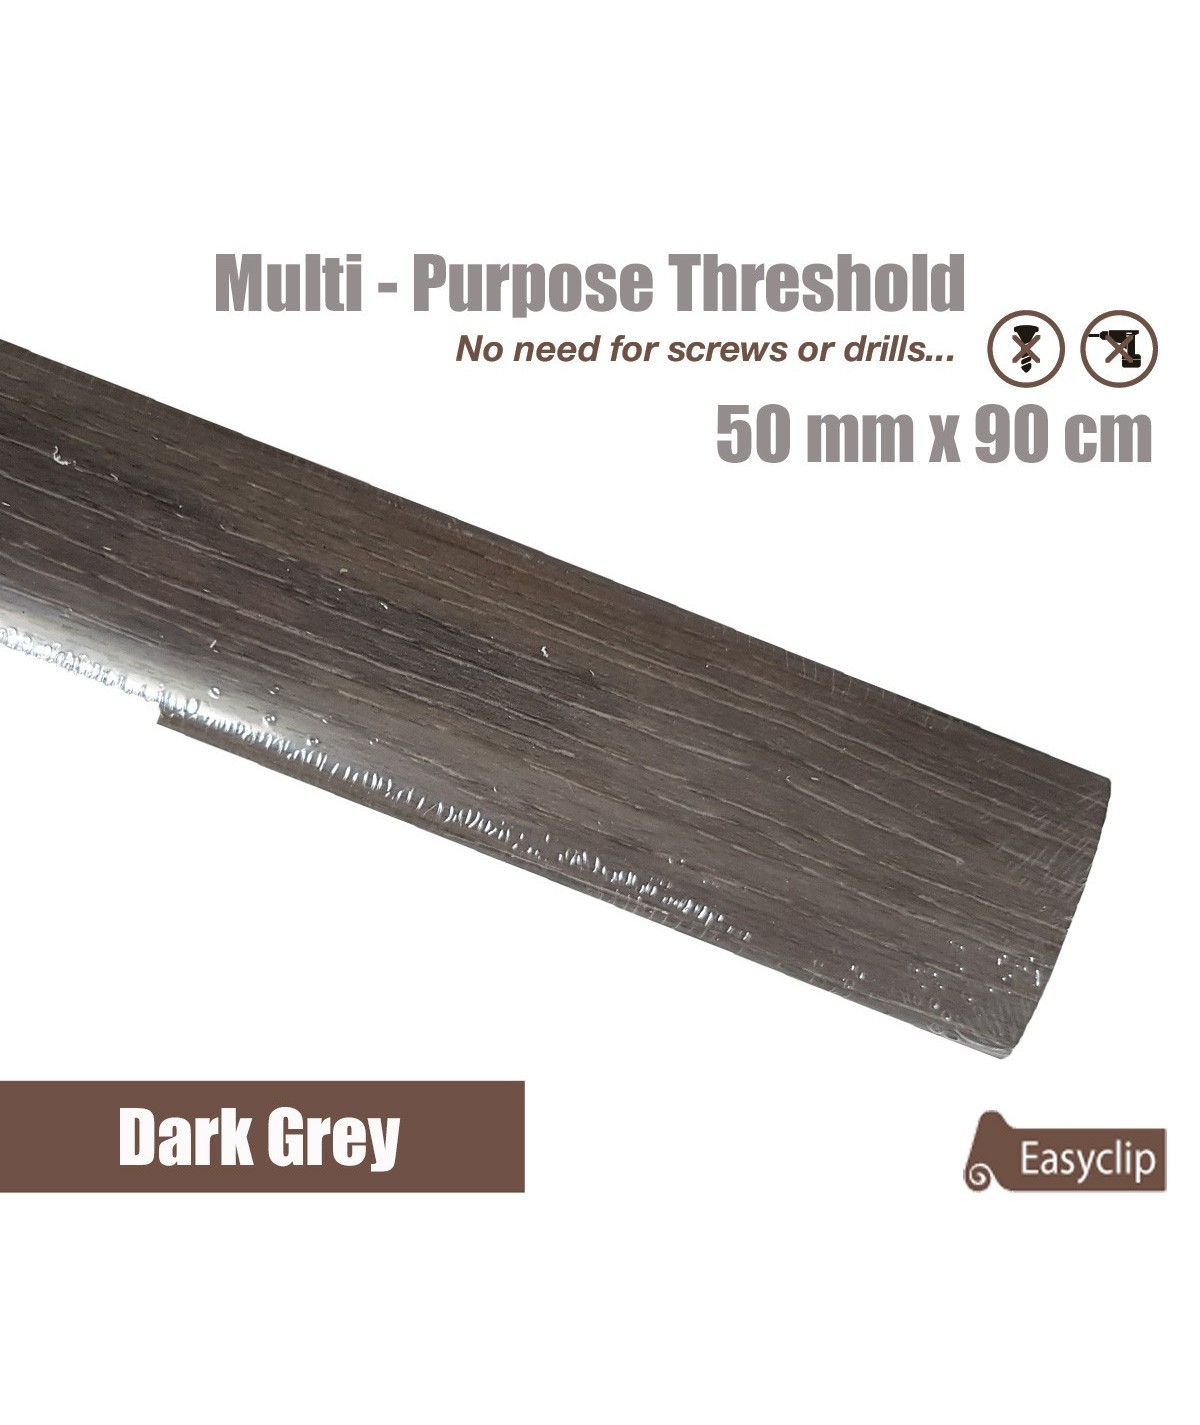 Dark Grey Laminated Transition Threshold Strip  50mm x 90cm Multi-Height/Pivots